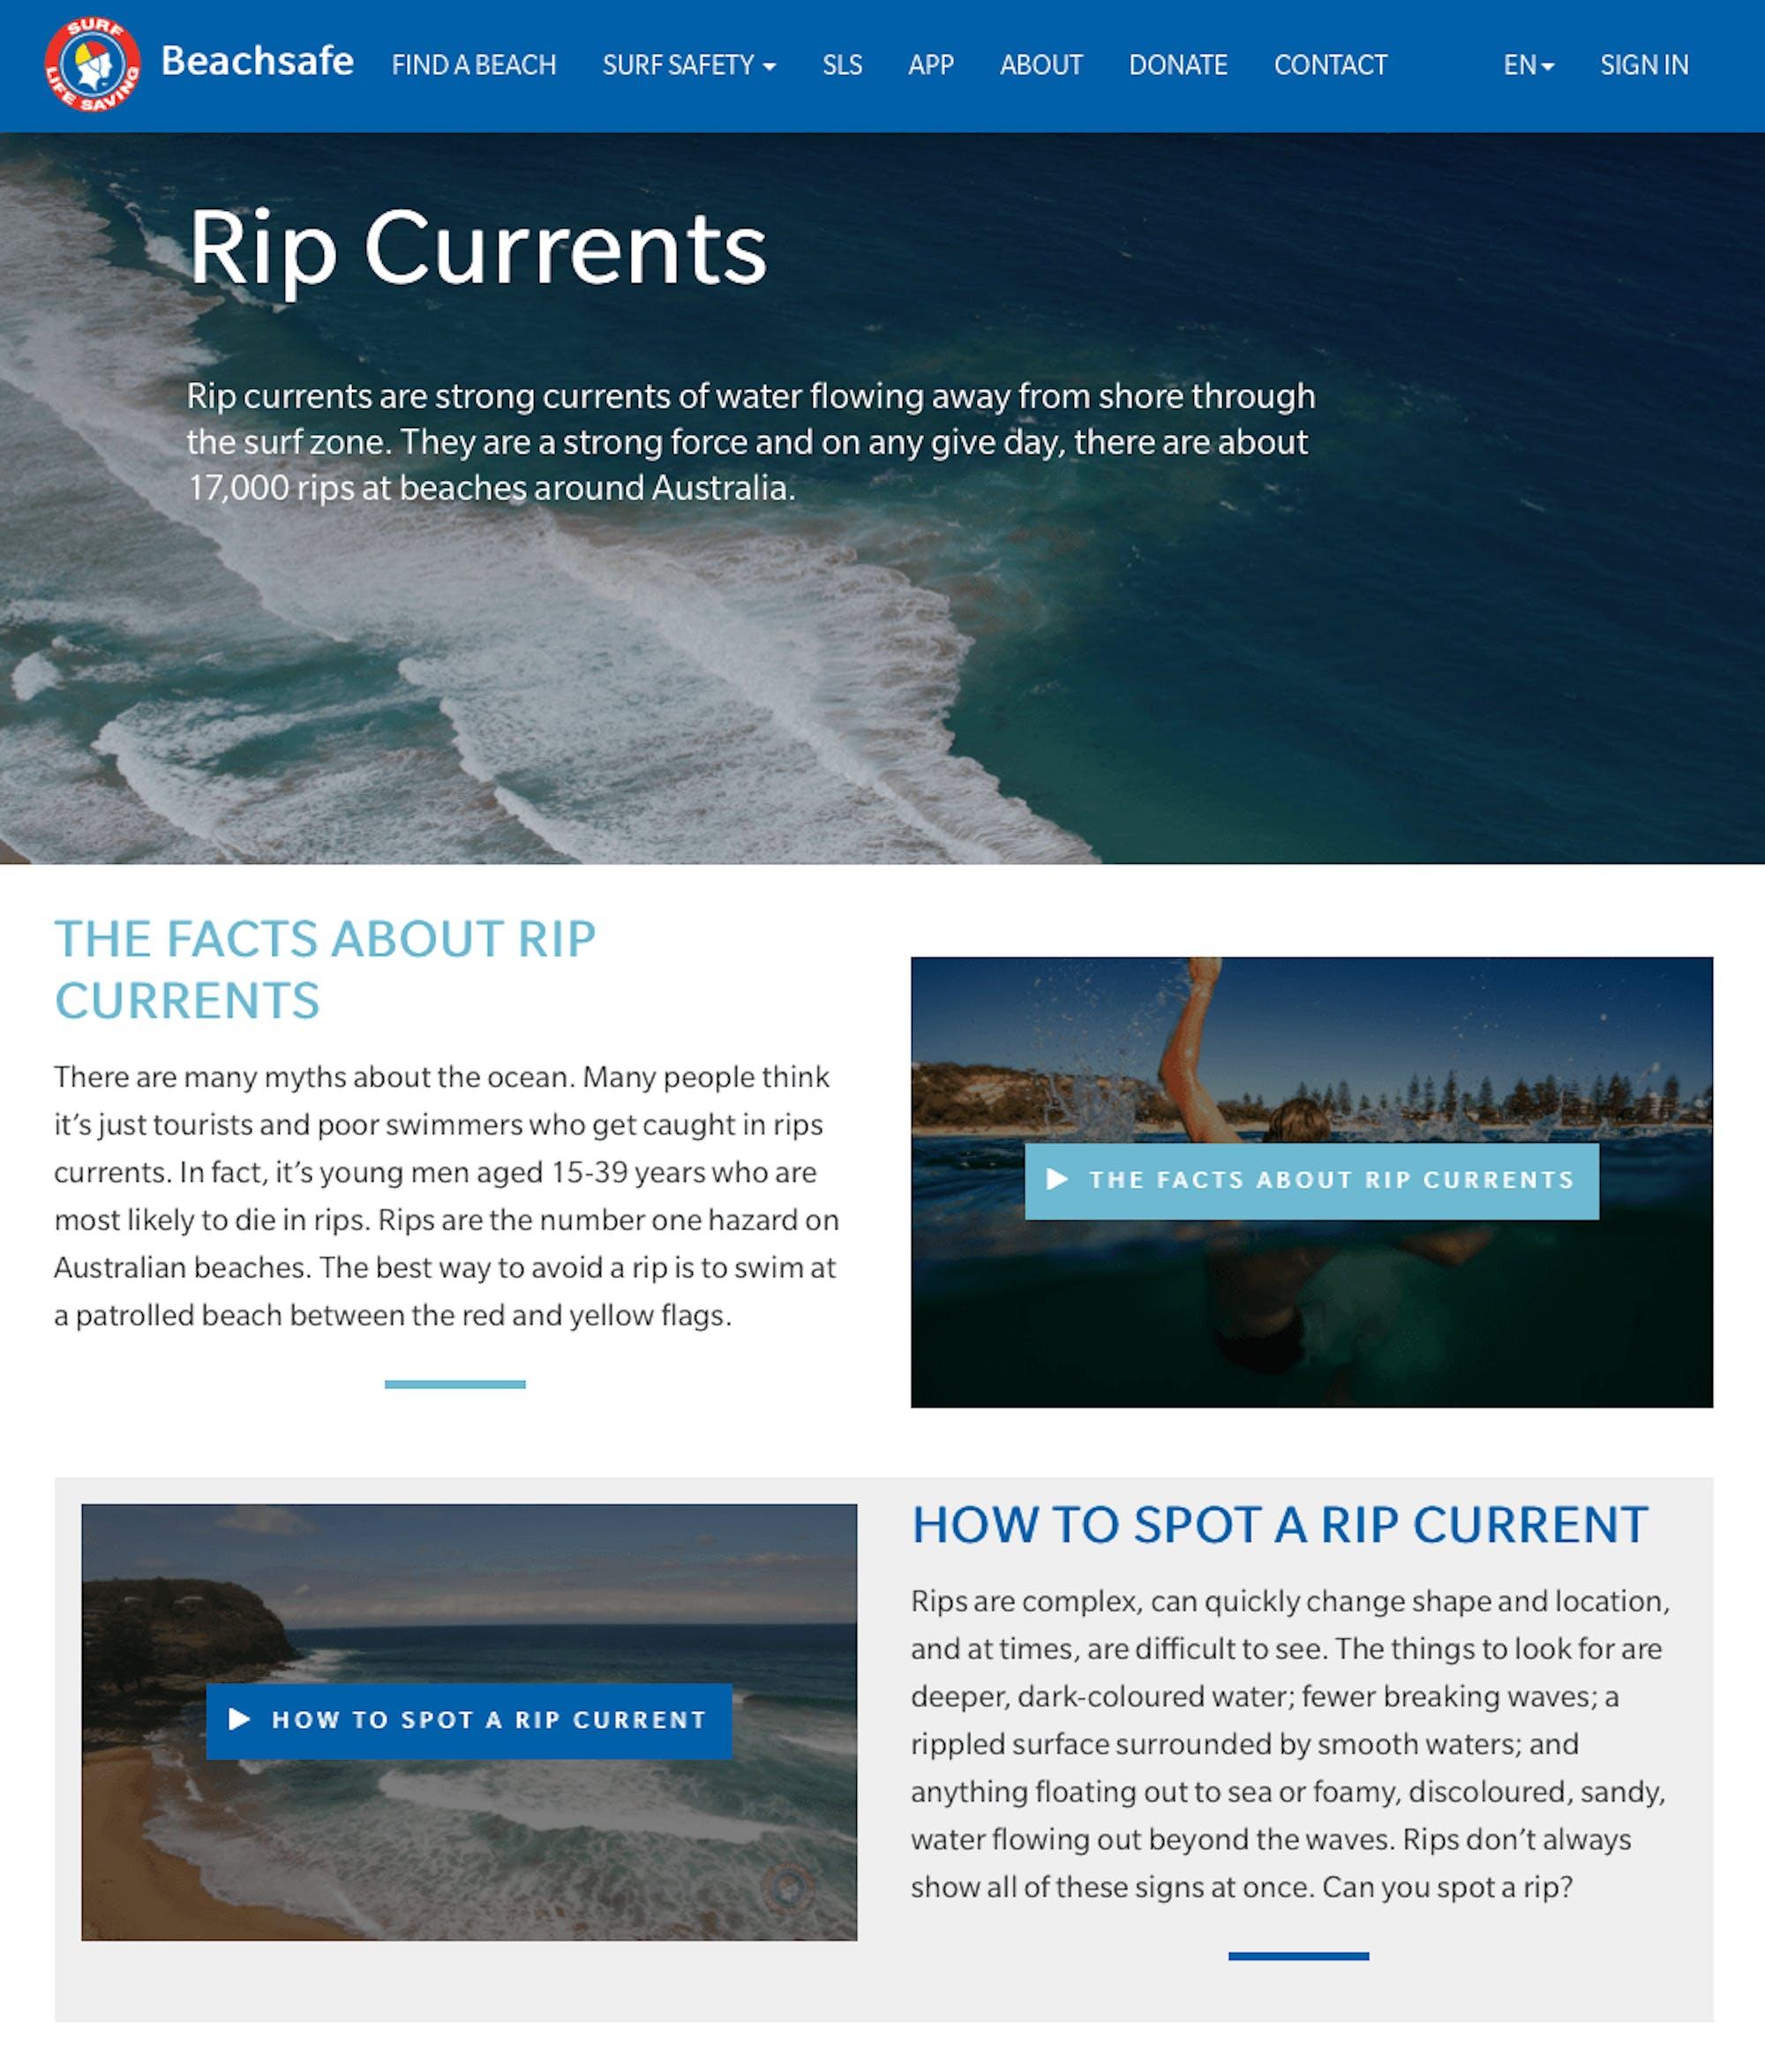 Beachsafe knowledge base